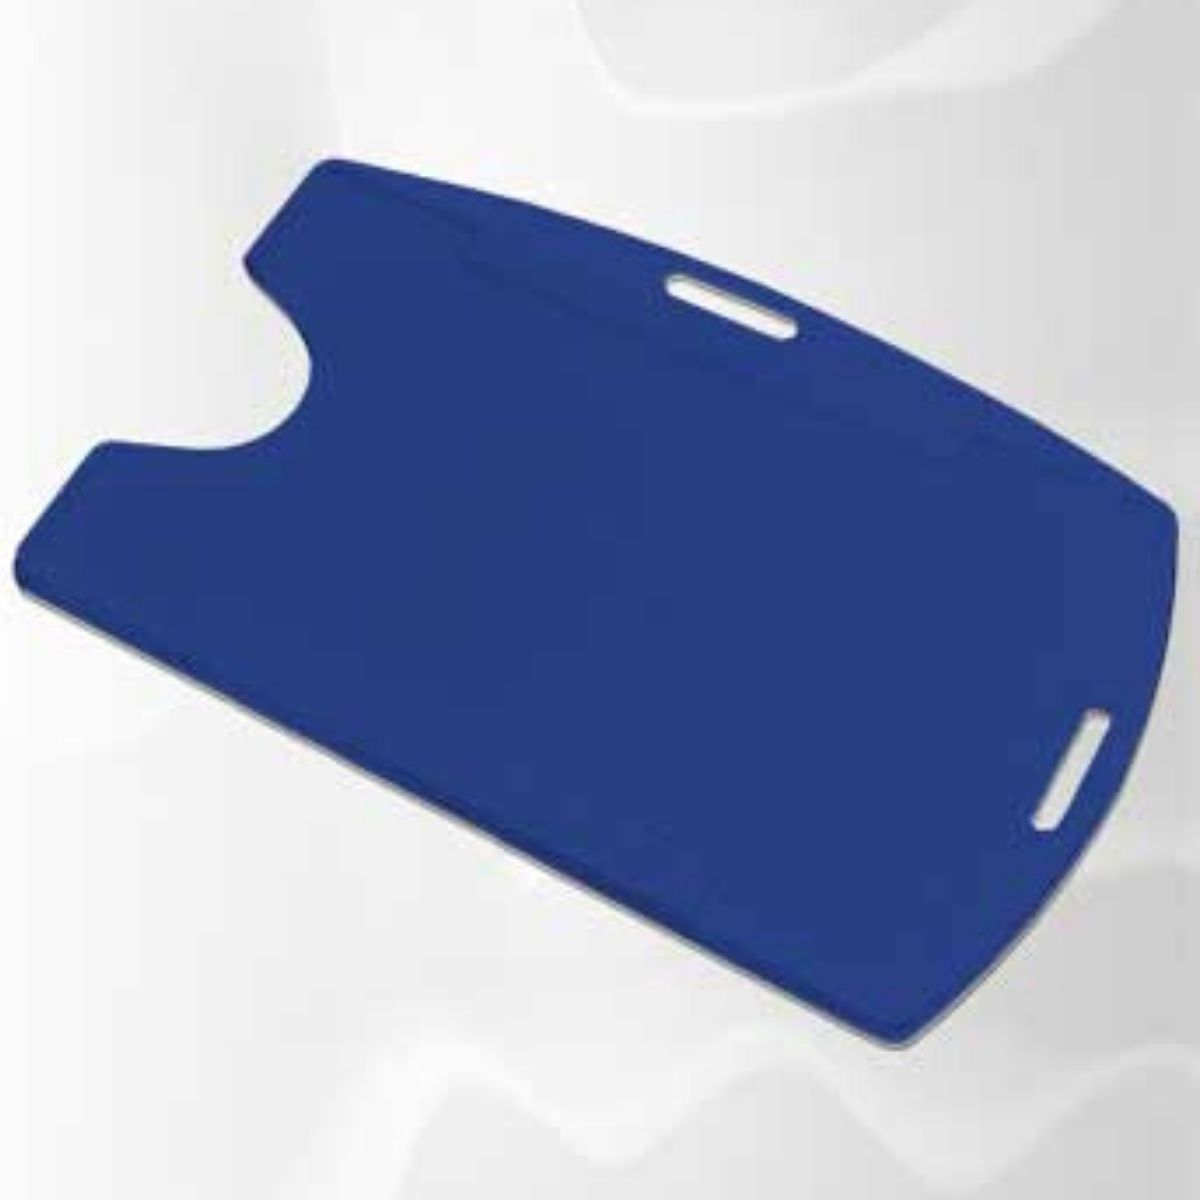 Kit 1000 Protetores Porta Crachá Rígido M3 Conjugado Azul Royal  - Click Suprimentos